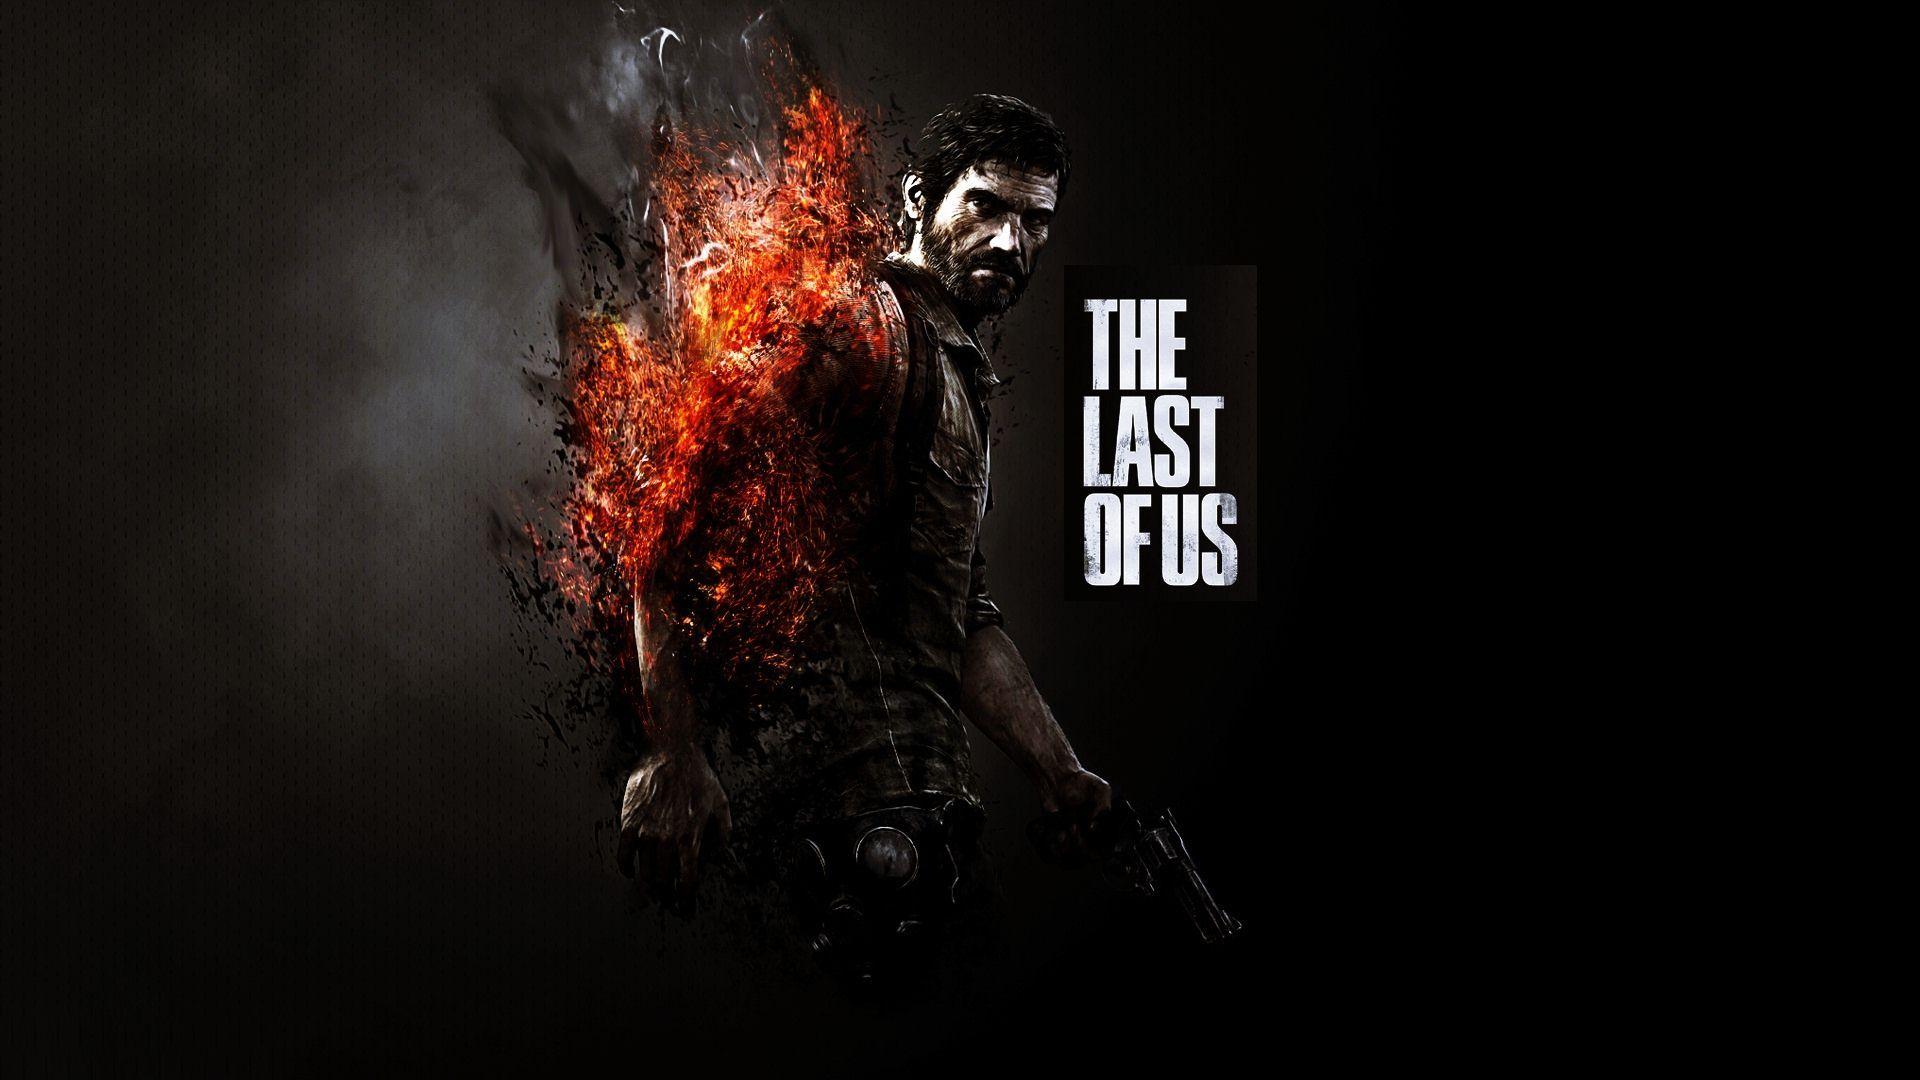 Joel The Last Of Us Art Hd Wallpaper Art Hd Wallpaper